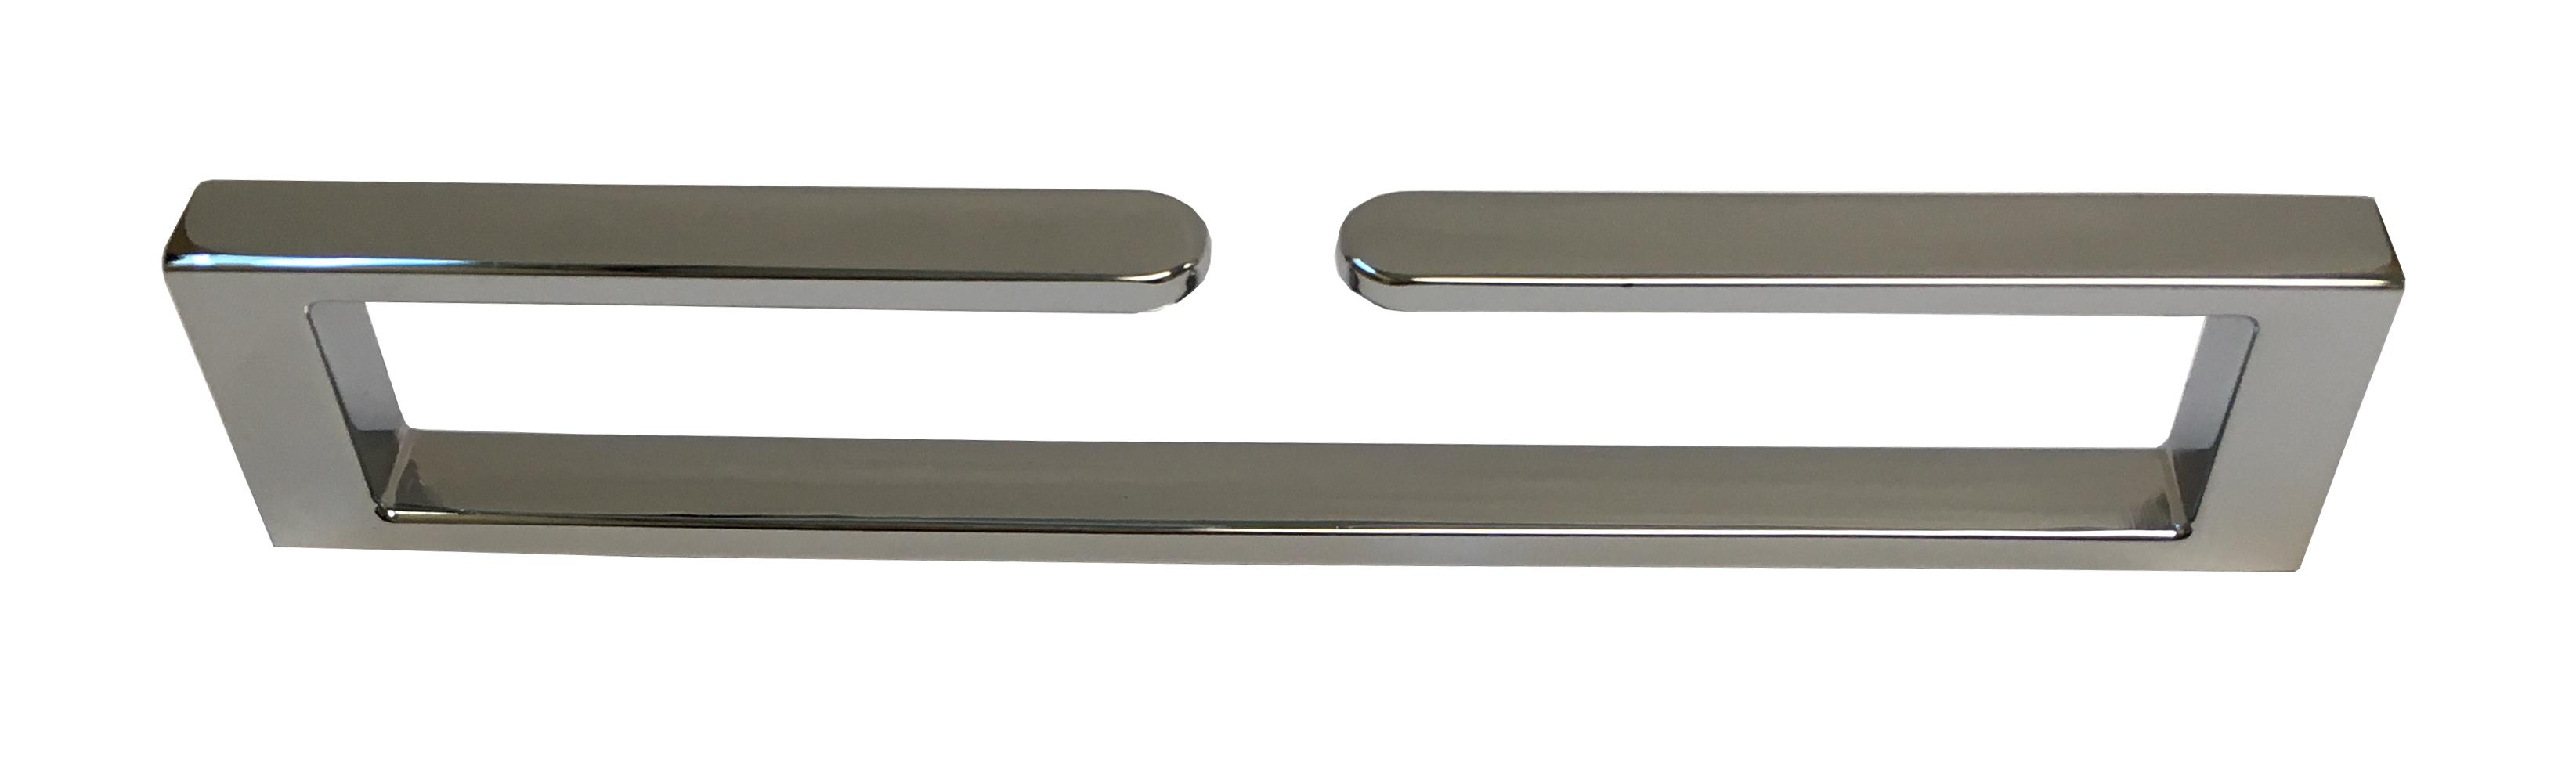 Chrome Senior Handle UZ-SENIOR-160-01 Side Angle for Kitchen